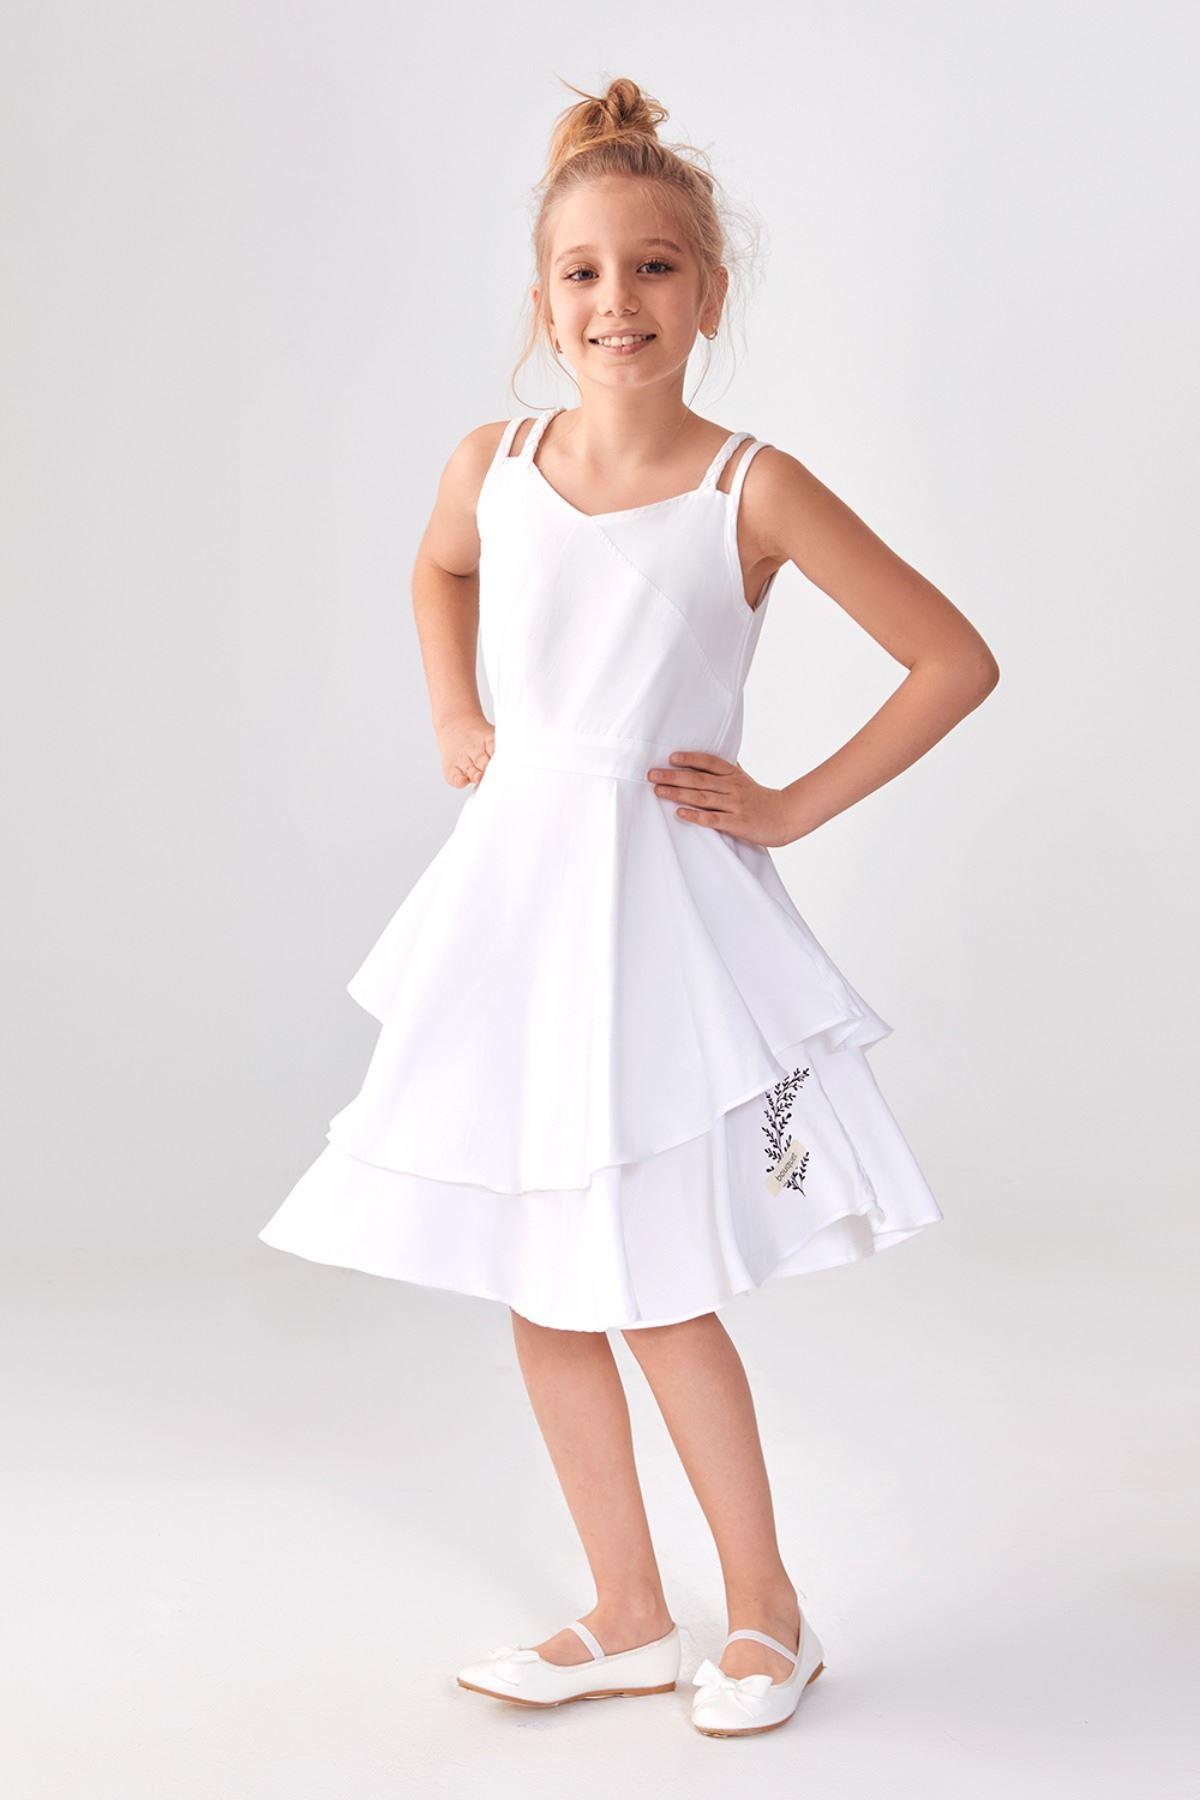 Duru Beyaz Elbise